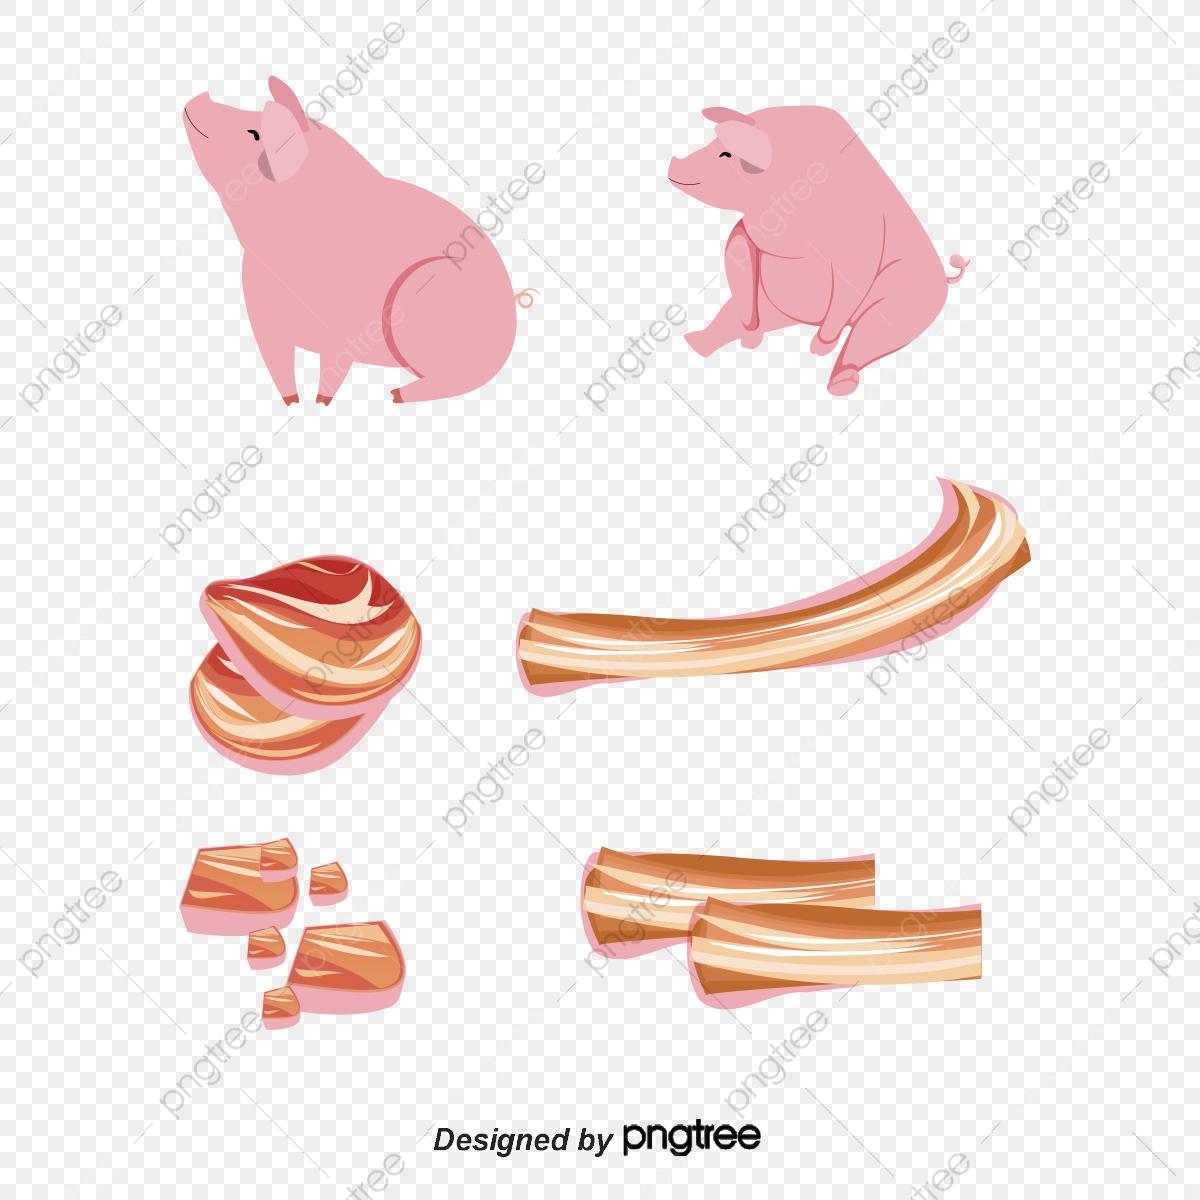 Cartoon and pork vector. Ham clipart pig